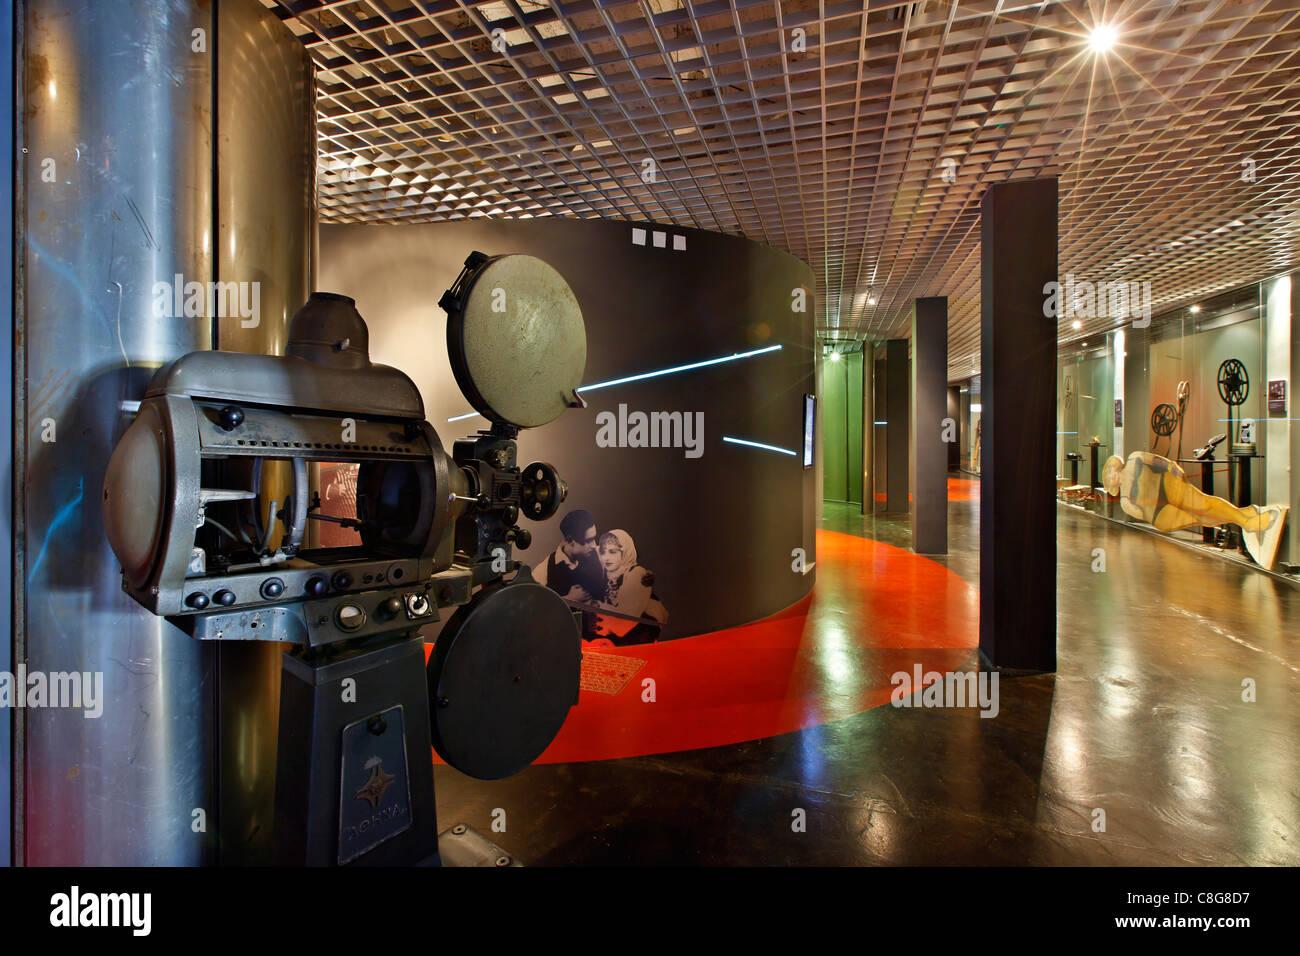 The museum of cinema, in Thessaloniki, Macedonia, Greece - Stock Image